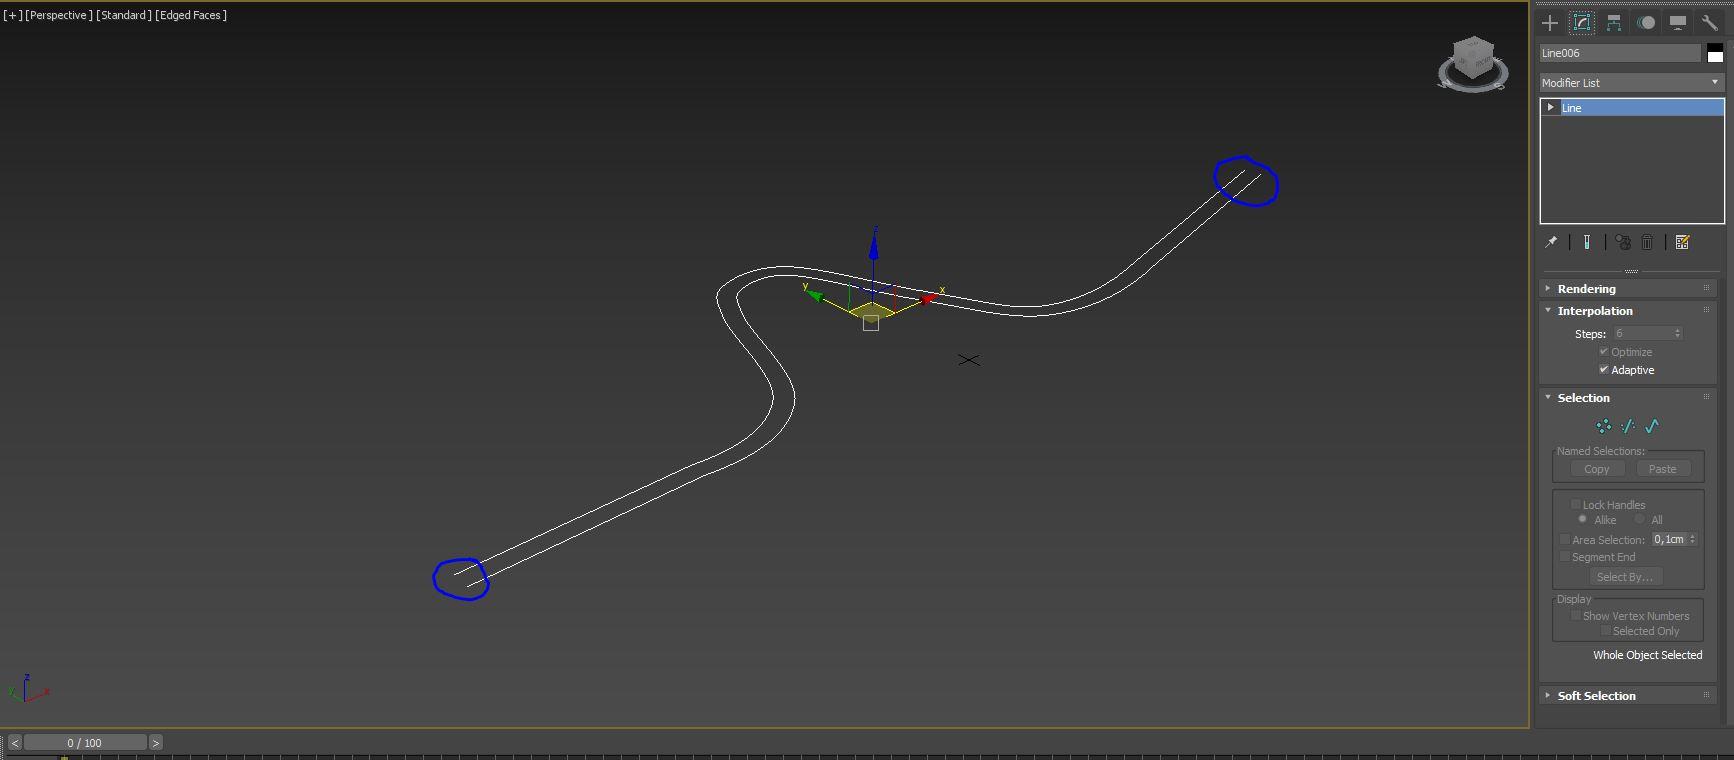 Line_02.JPG.d8b0c3eeaa52ea2a5a4eaf012ff8f757.JPG